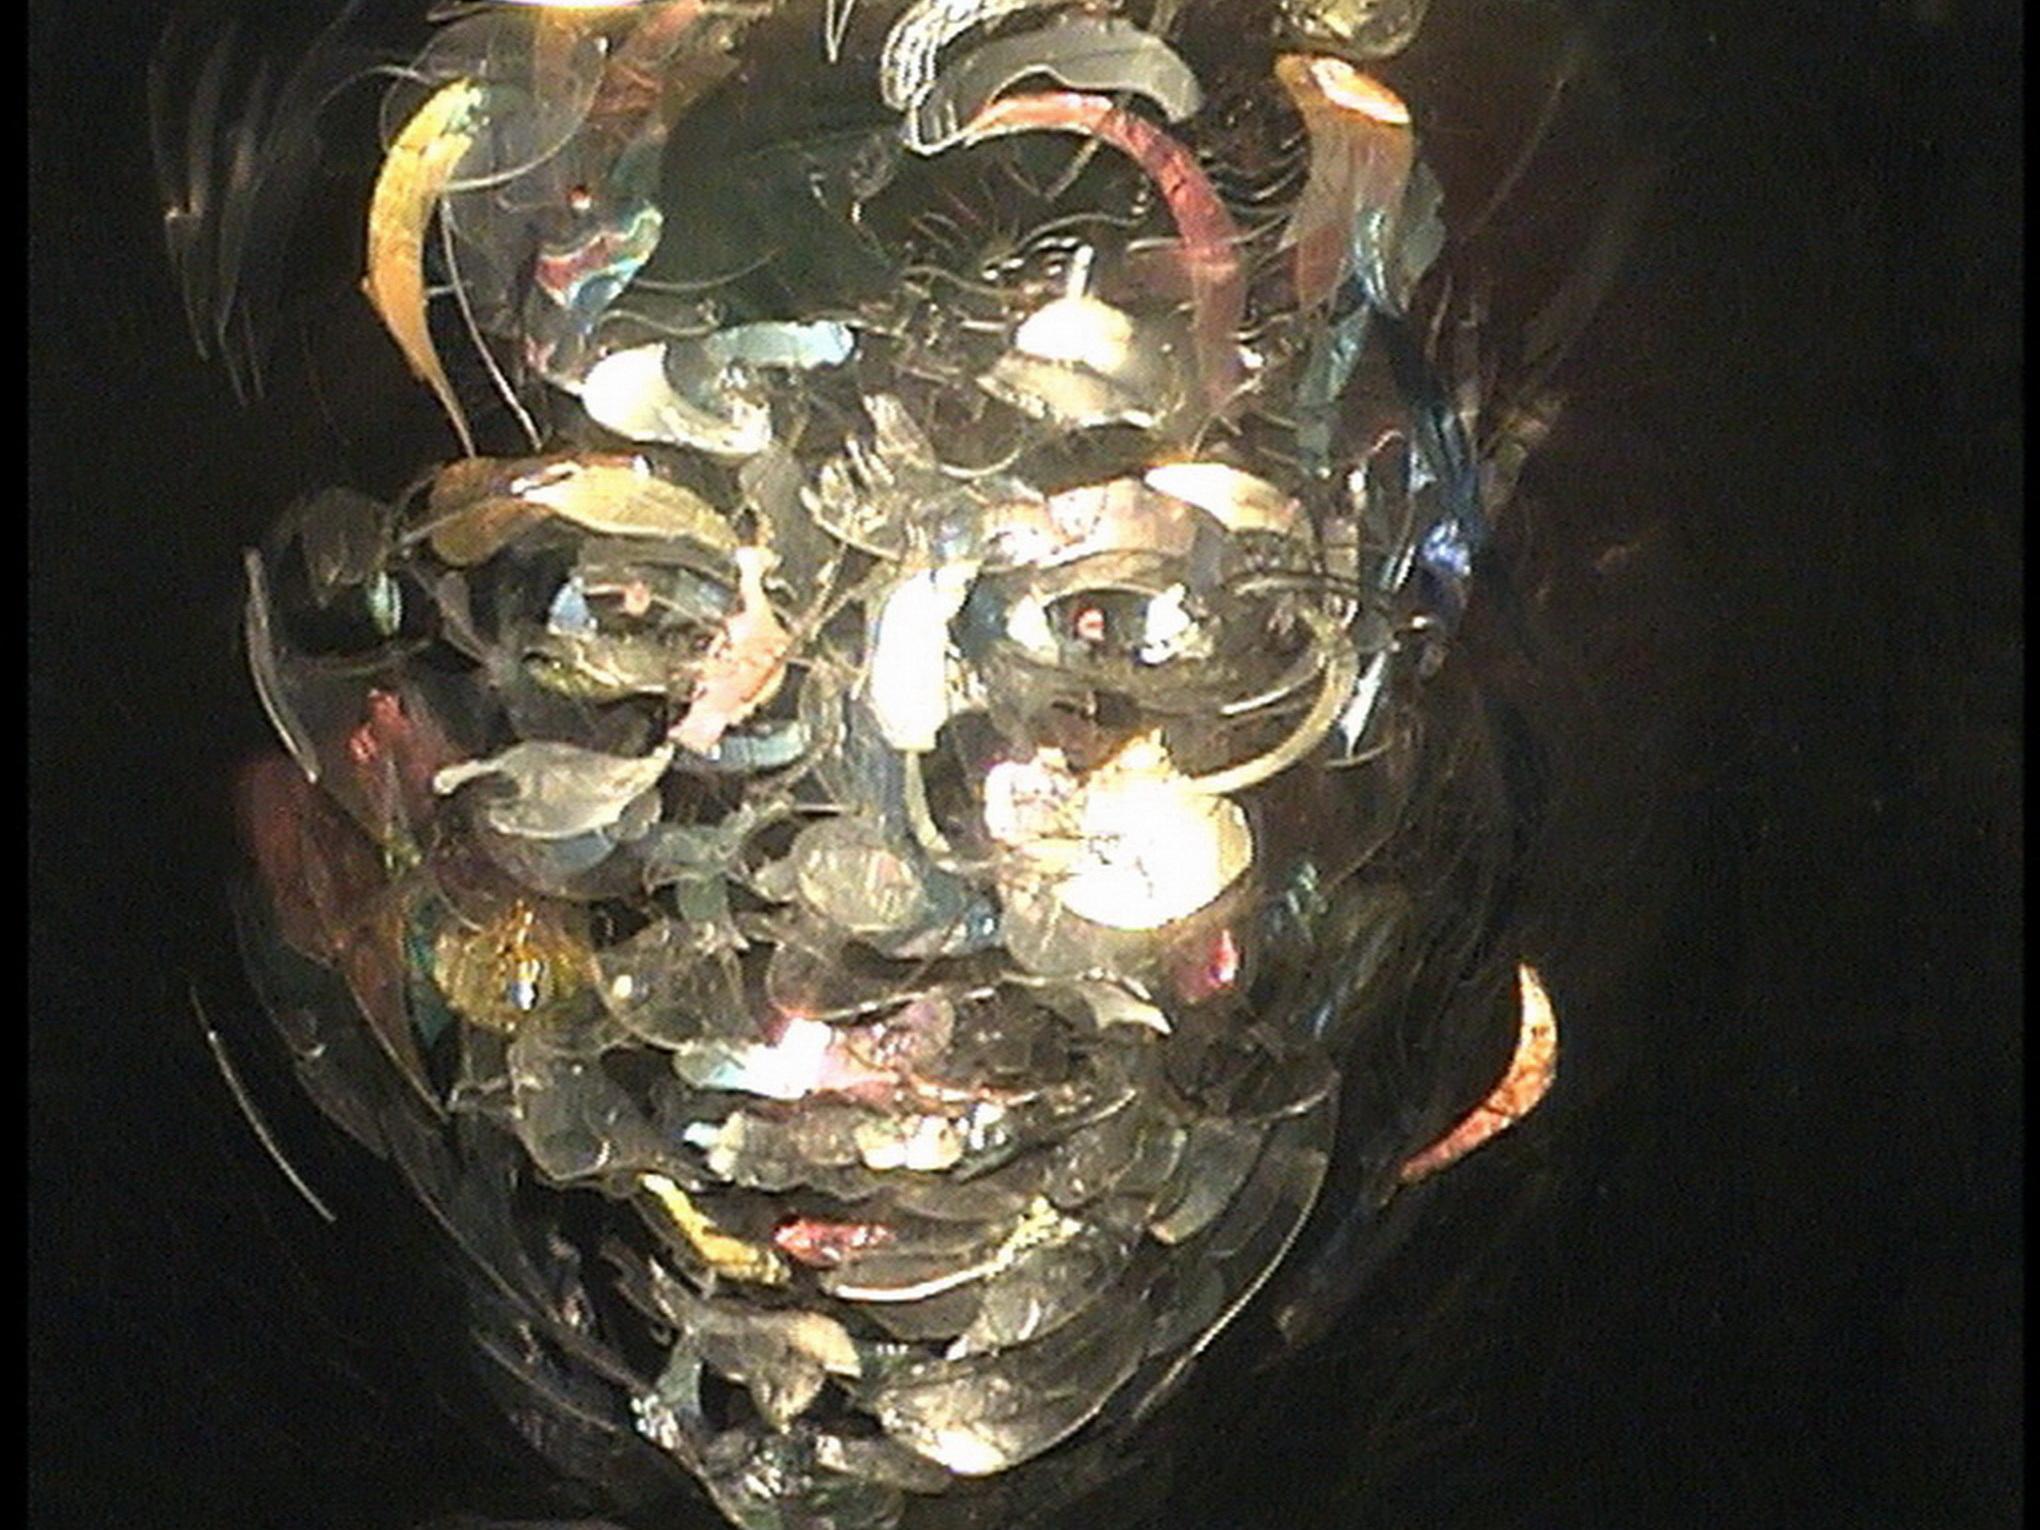 Maurizio Aprea - Family of ligts - Endosculpture